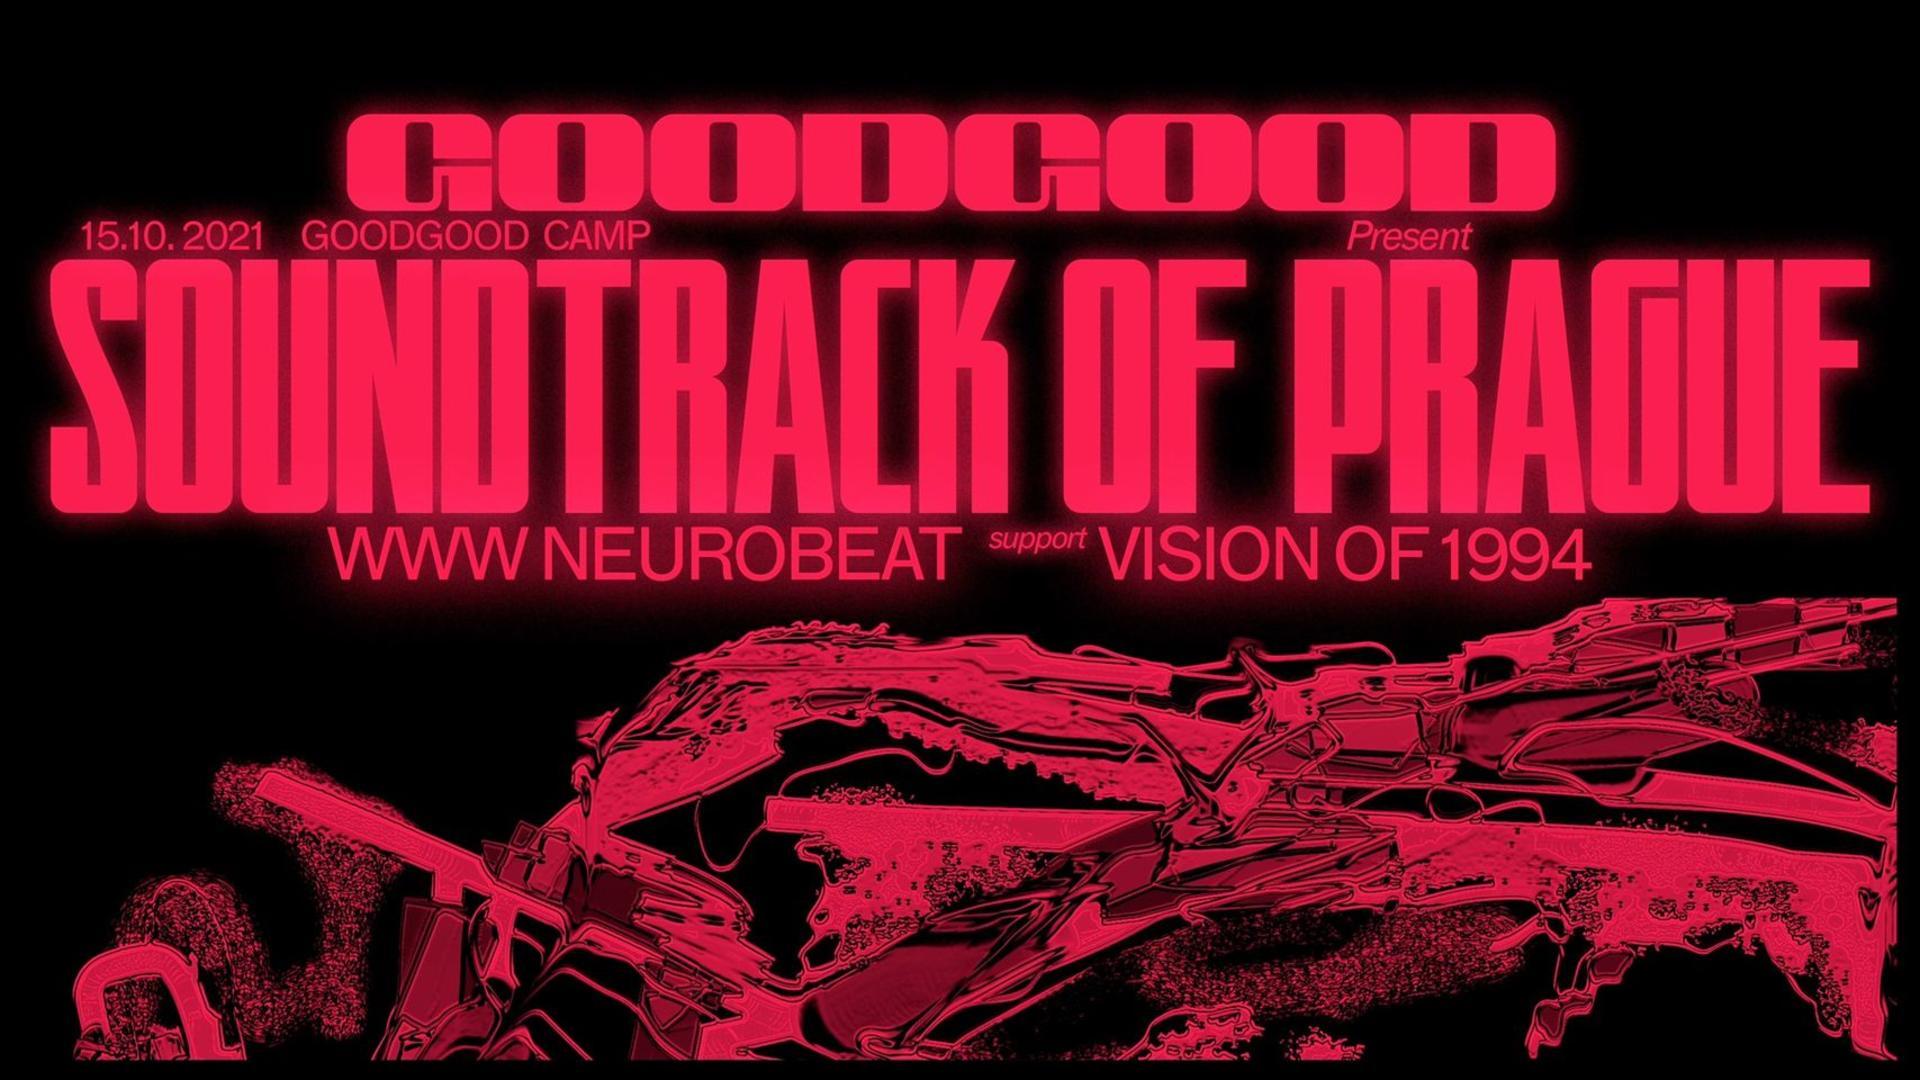 Soundtrack of Prague